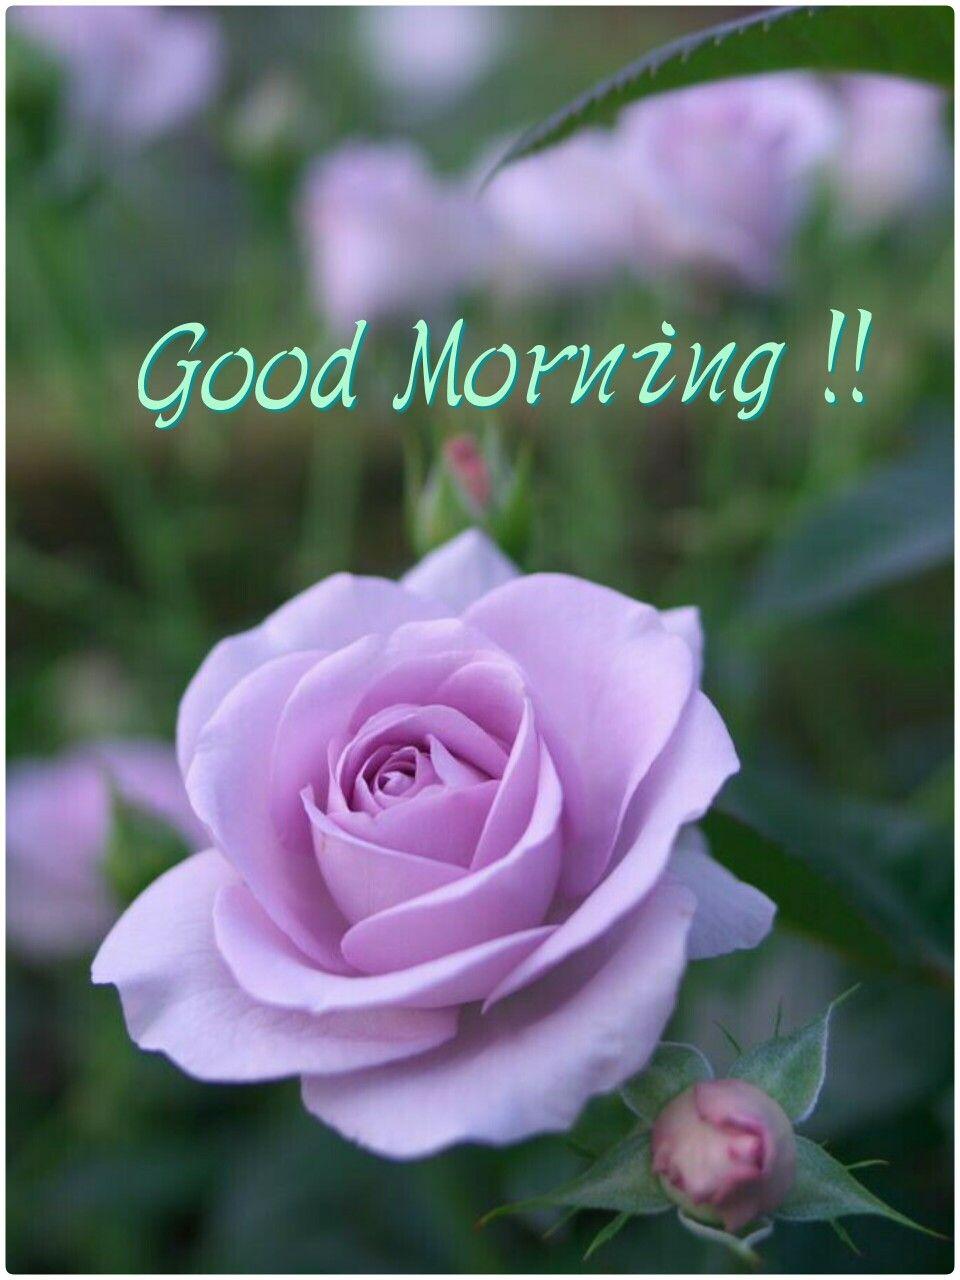 good morning good morning pinterest guten morgen bilder morgen bilder und guten morgen. Black Bedroom Furniture Sets. Home Design Ideas